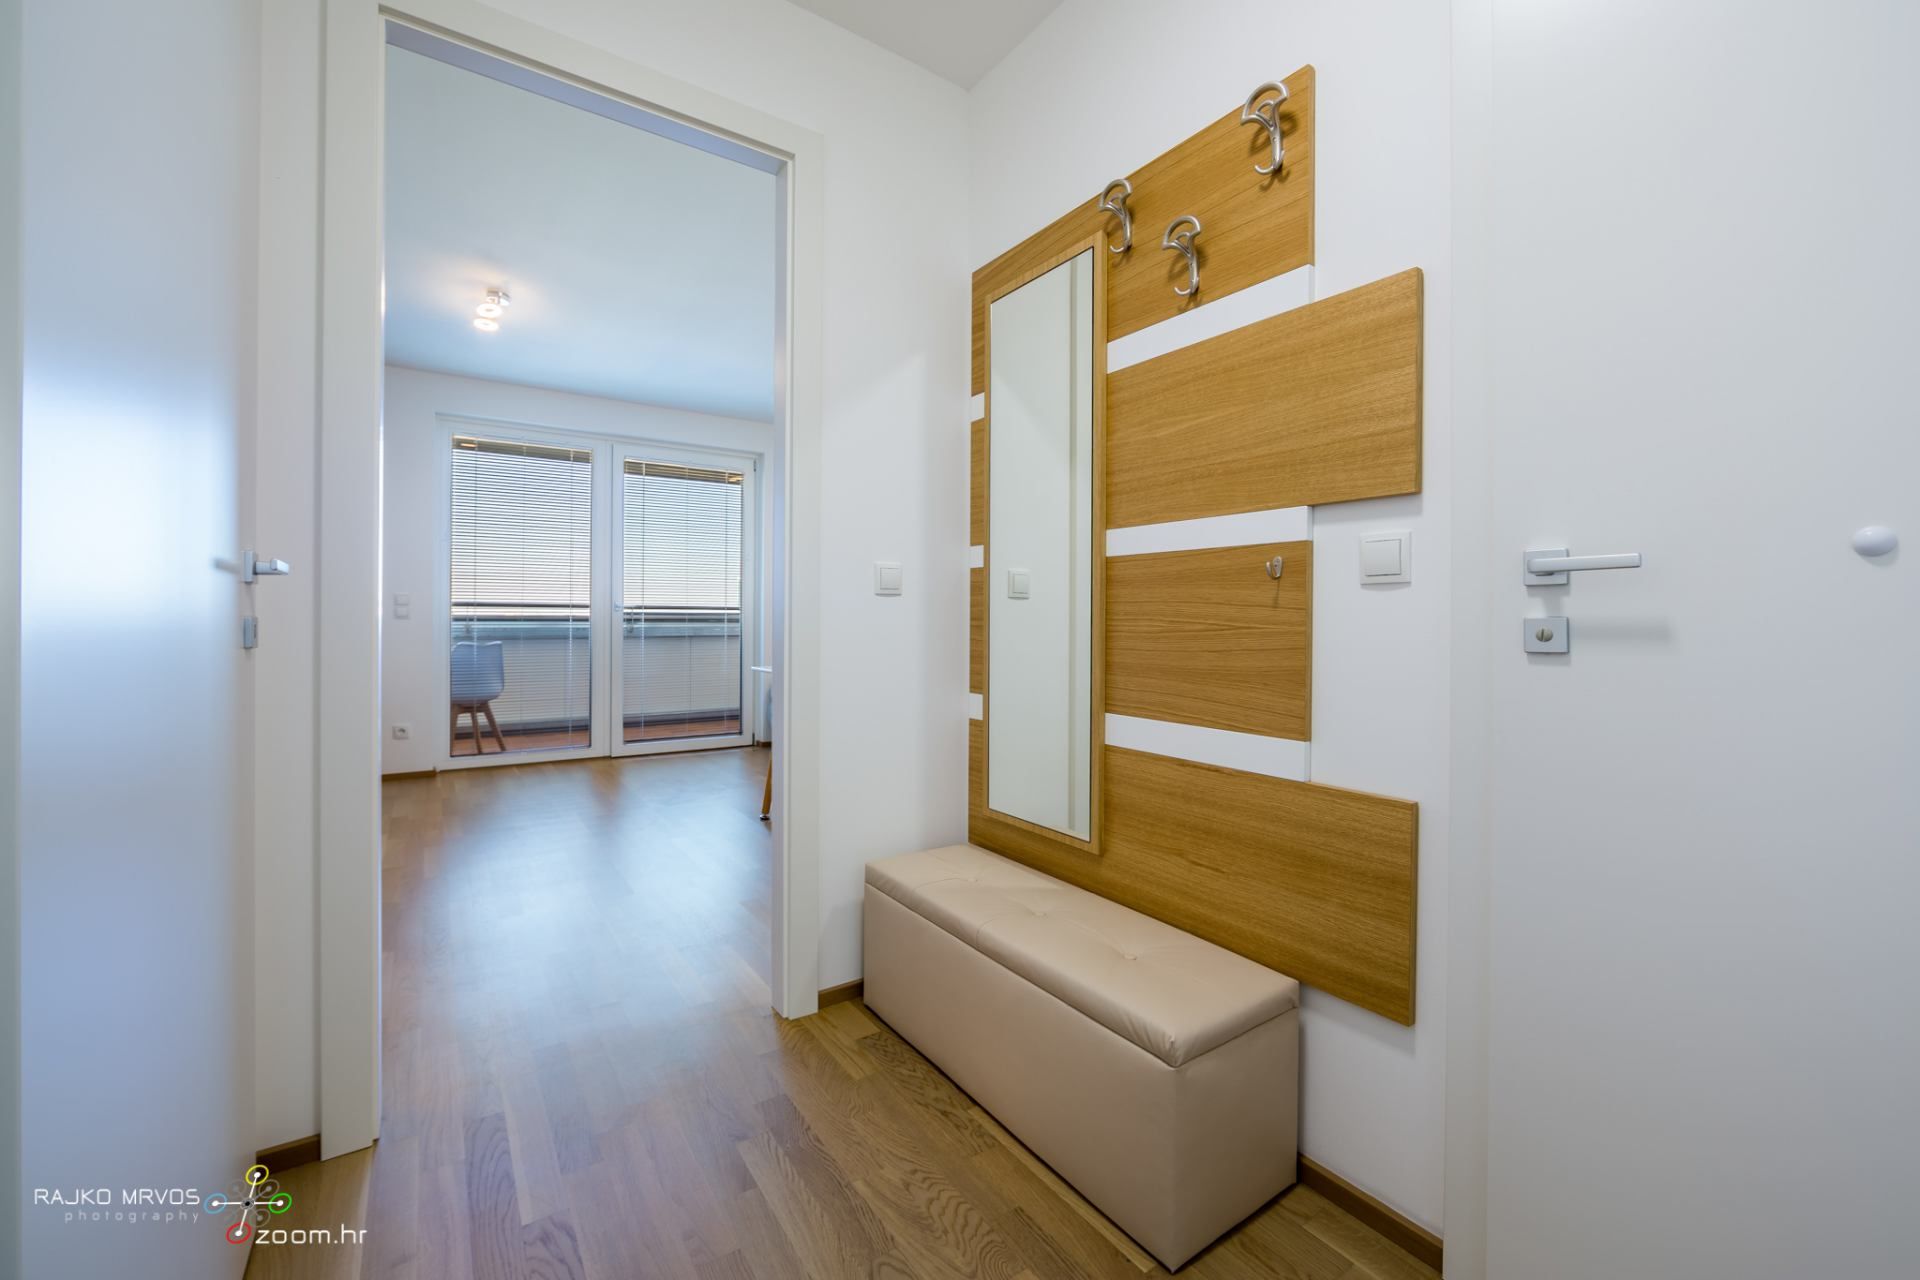 fotografiranje-interijera-fotograf-eksterijera-apartmana-vila-kuca-apartman-Beč-6